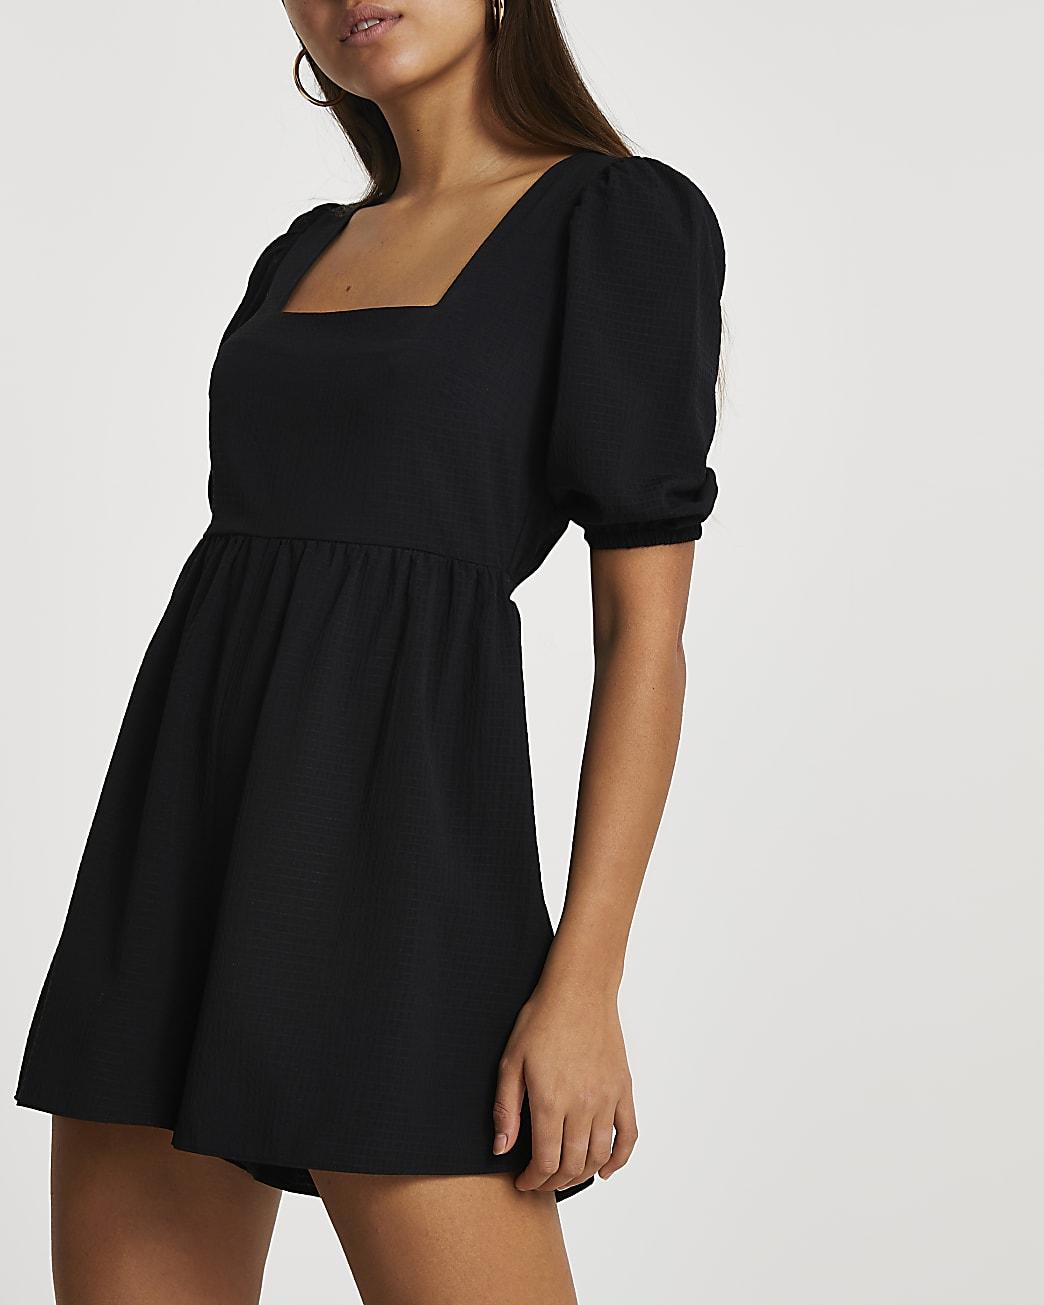 Black short sleeve playsuit